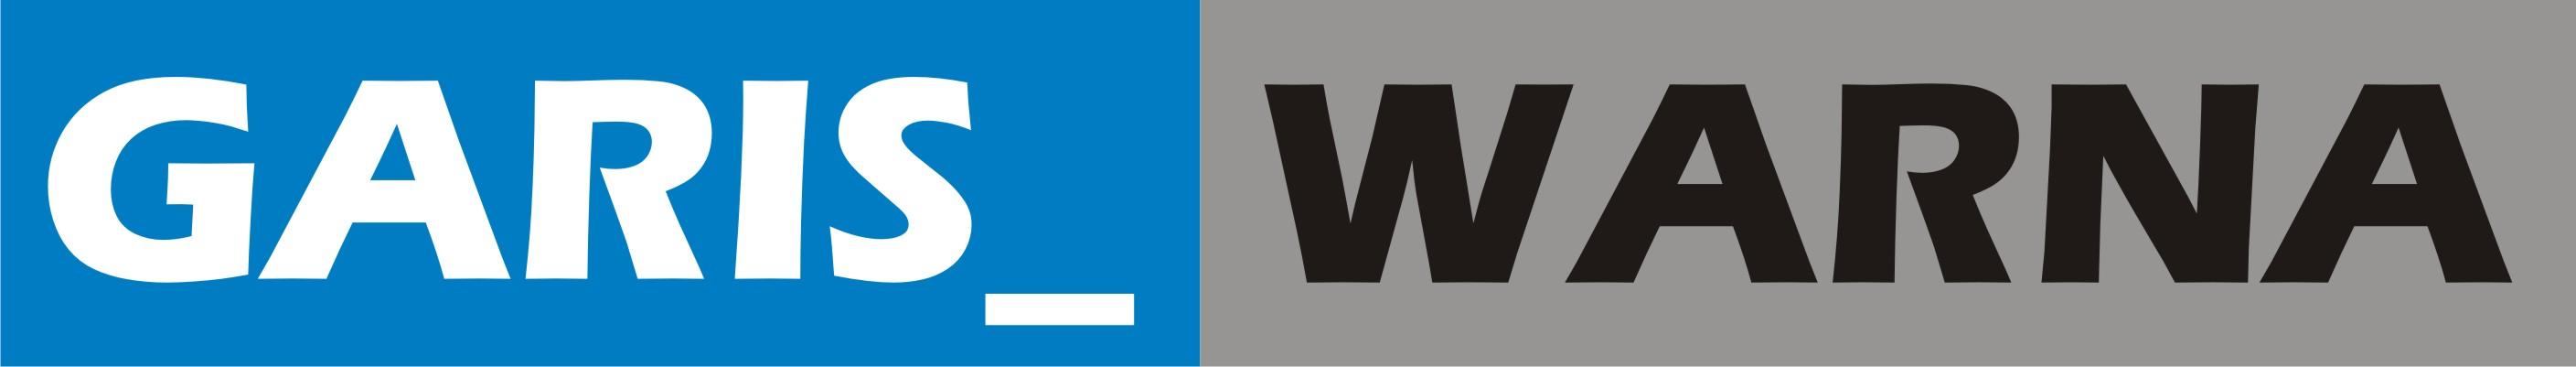 Logo 1 grs wrn